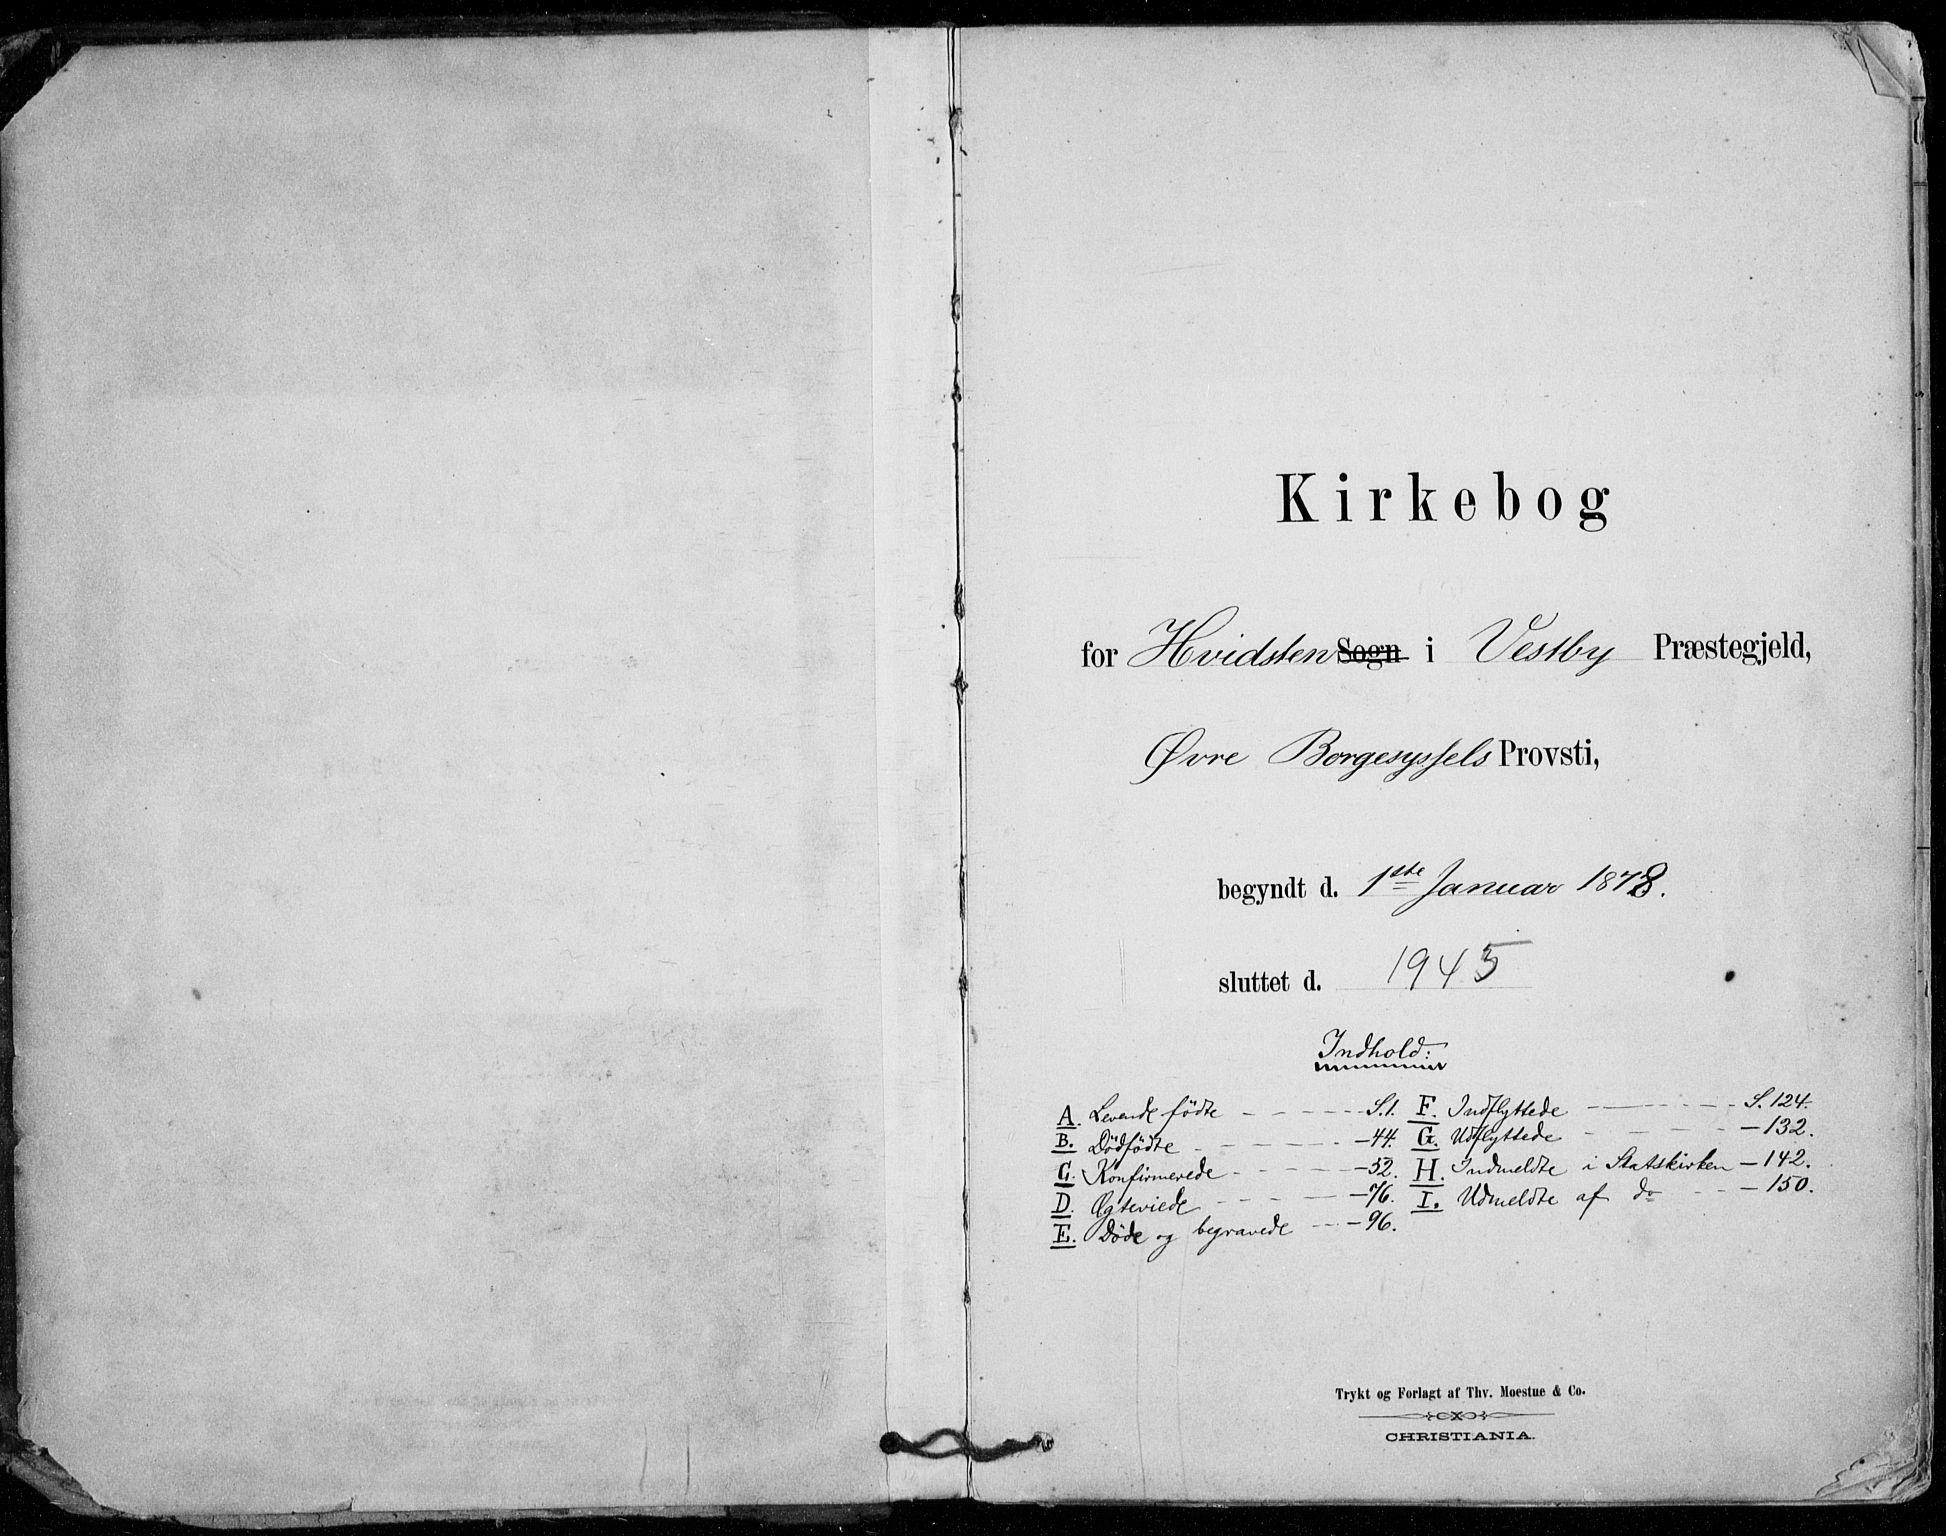 SAO, Vestby prestekontor Kirkebøker, F/Fd/L0001: Ministerialbok nr. IV 1, 1878-1945